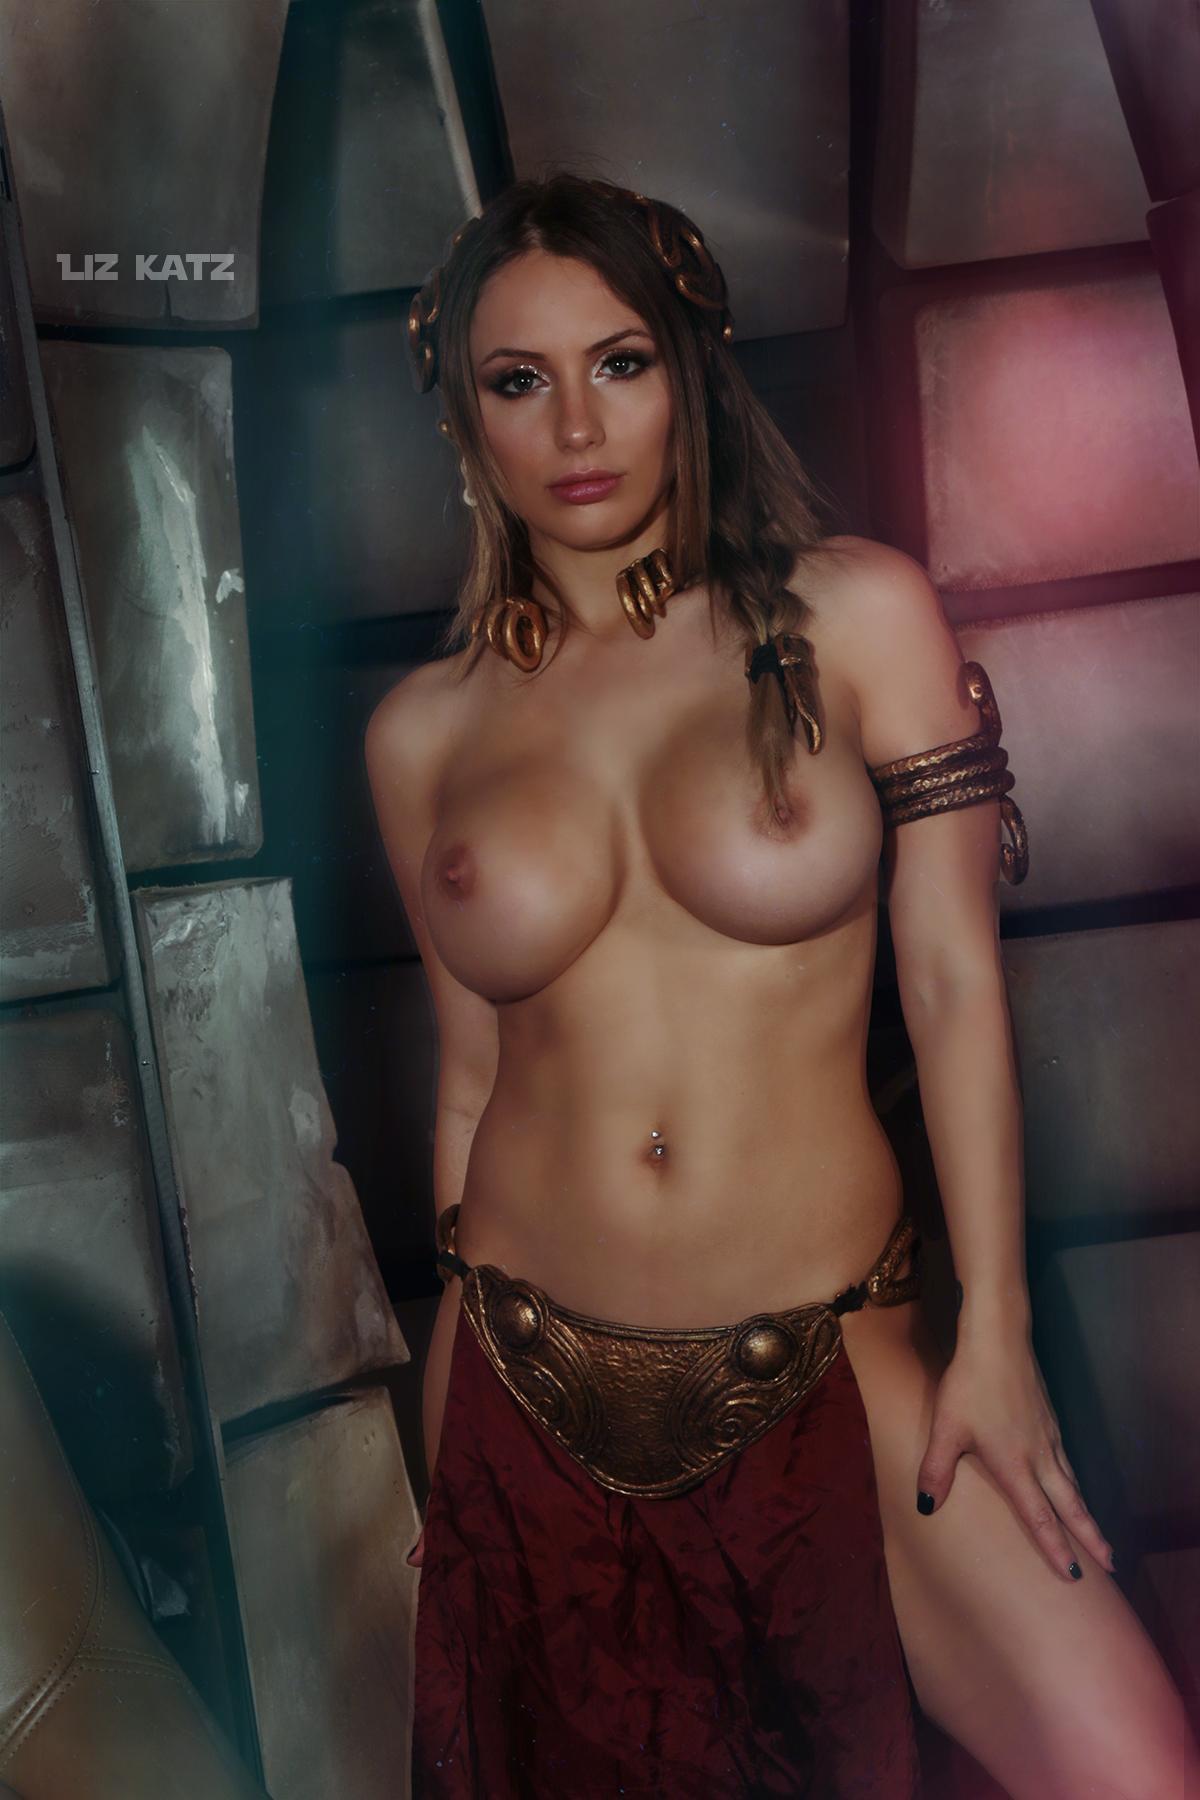 Liz Katz Slave Leia Nude Cosplay Onlyfans Leaked Photos 9